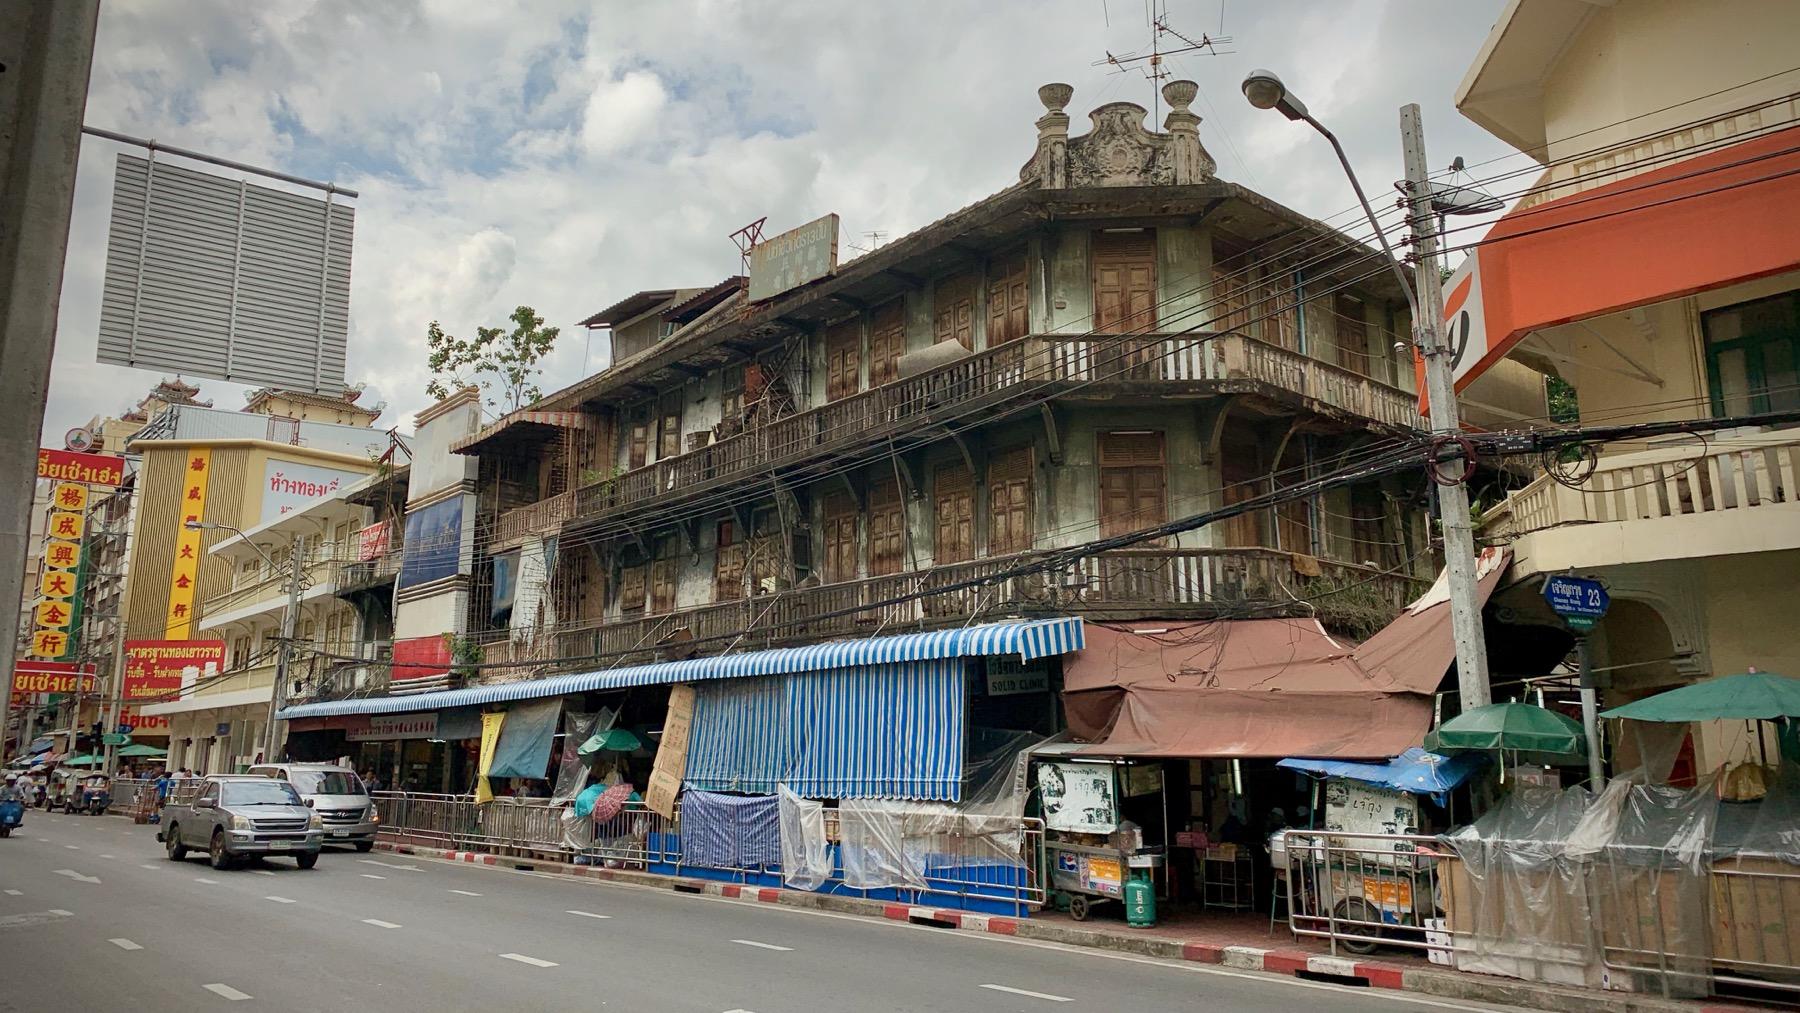 Urban Decay in Bangkok's Chinatown